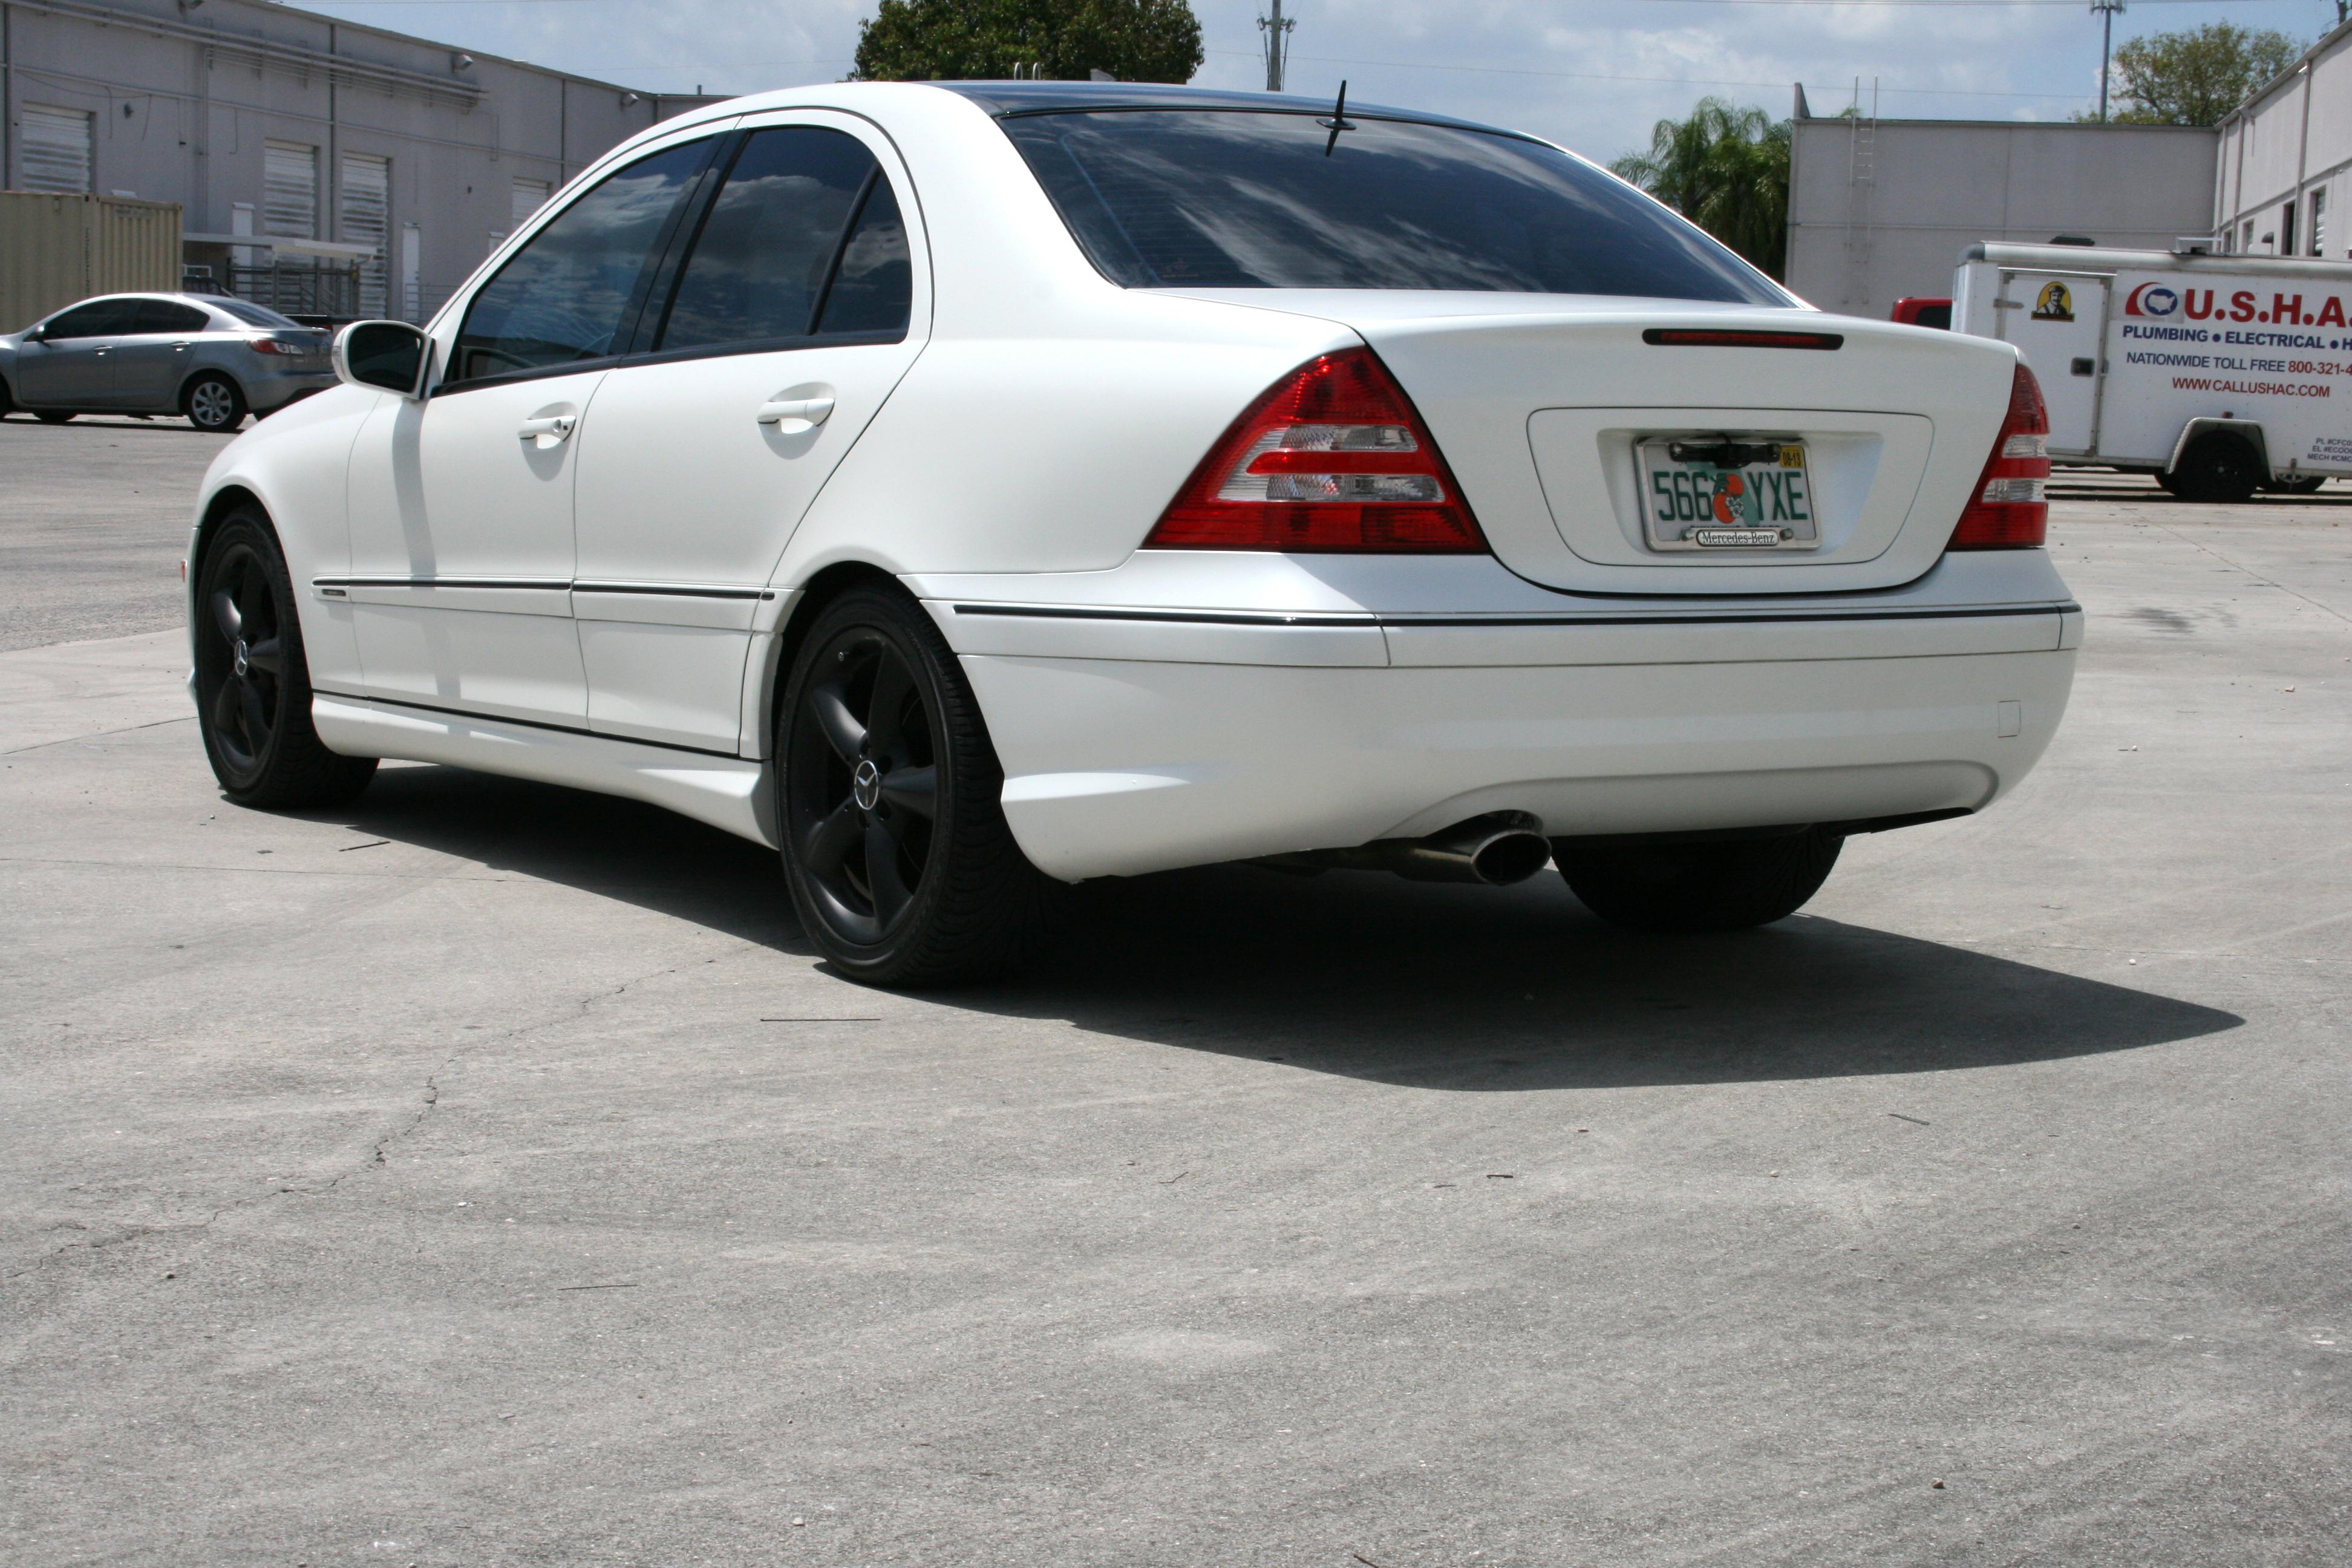 3m satin pearl white car wrap miami florida. Black Bedroom Furniture Sets. Home Design Ideas